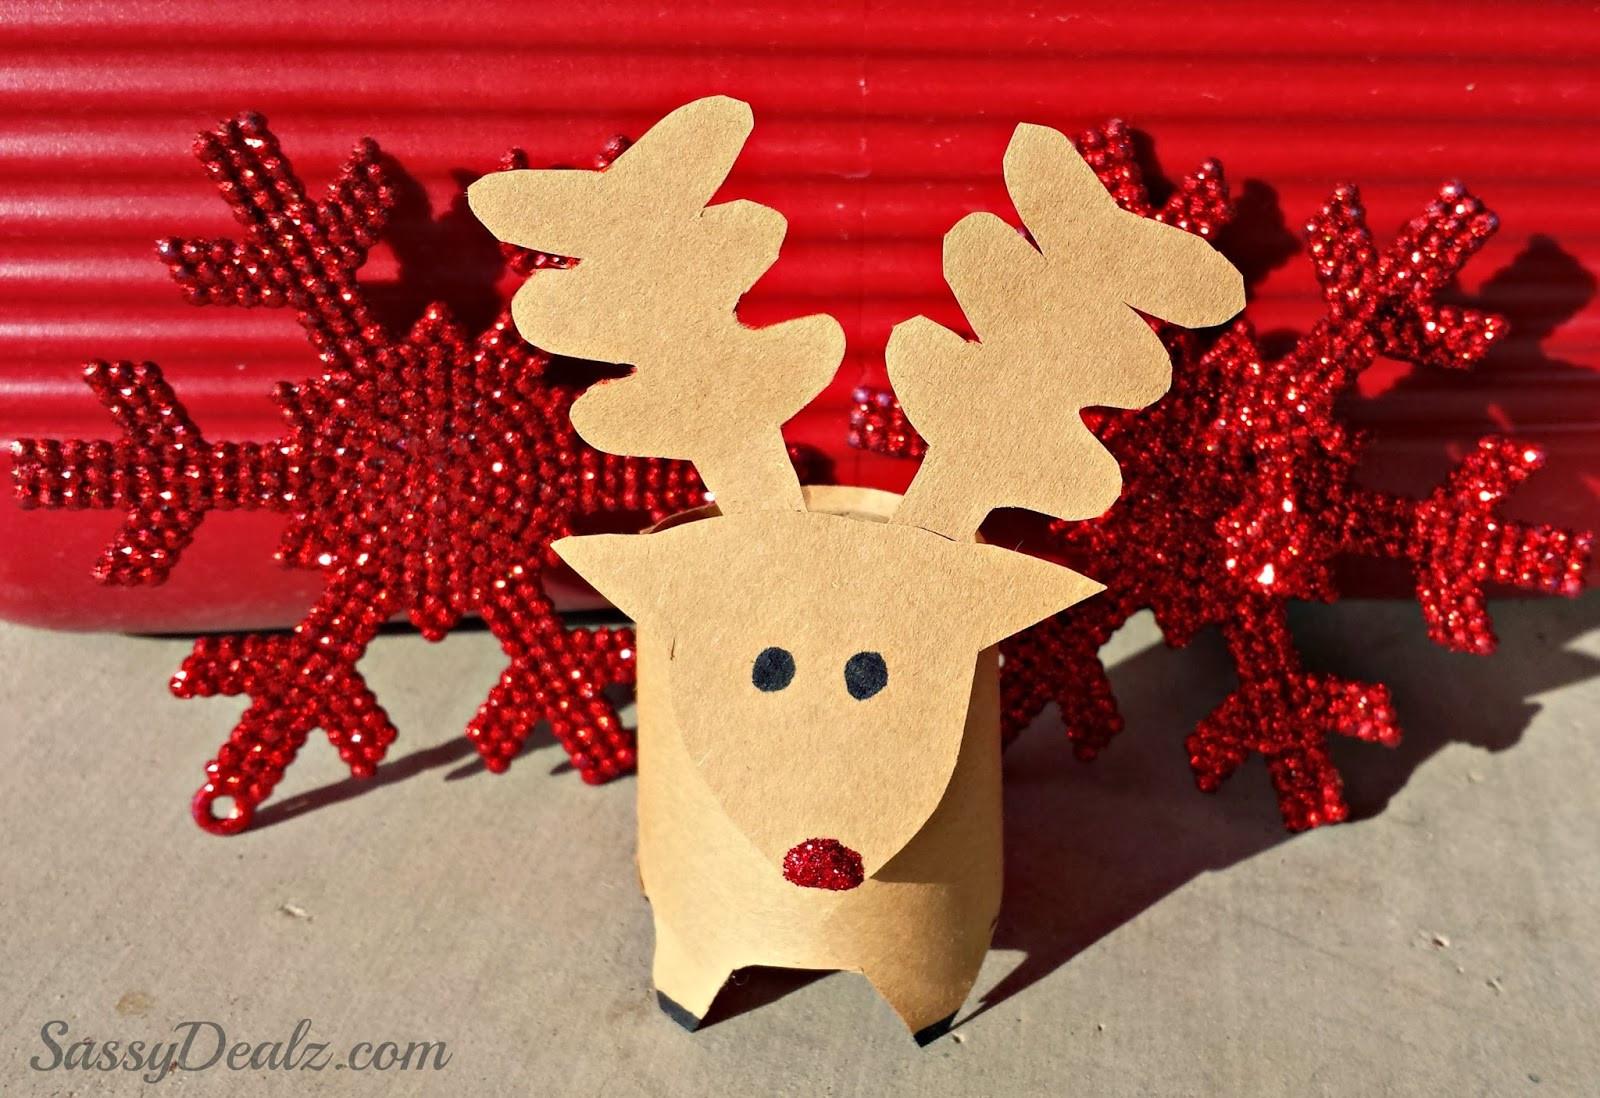 Toilet Paper Christmas Crafts  Mini Reindeer Toilet Paper Roll Christmas Craft For Kids